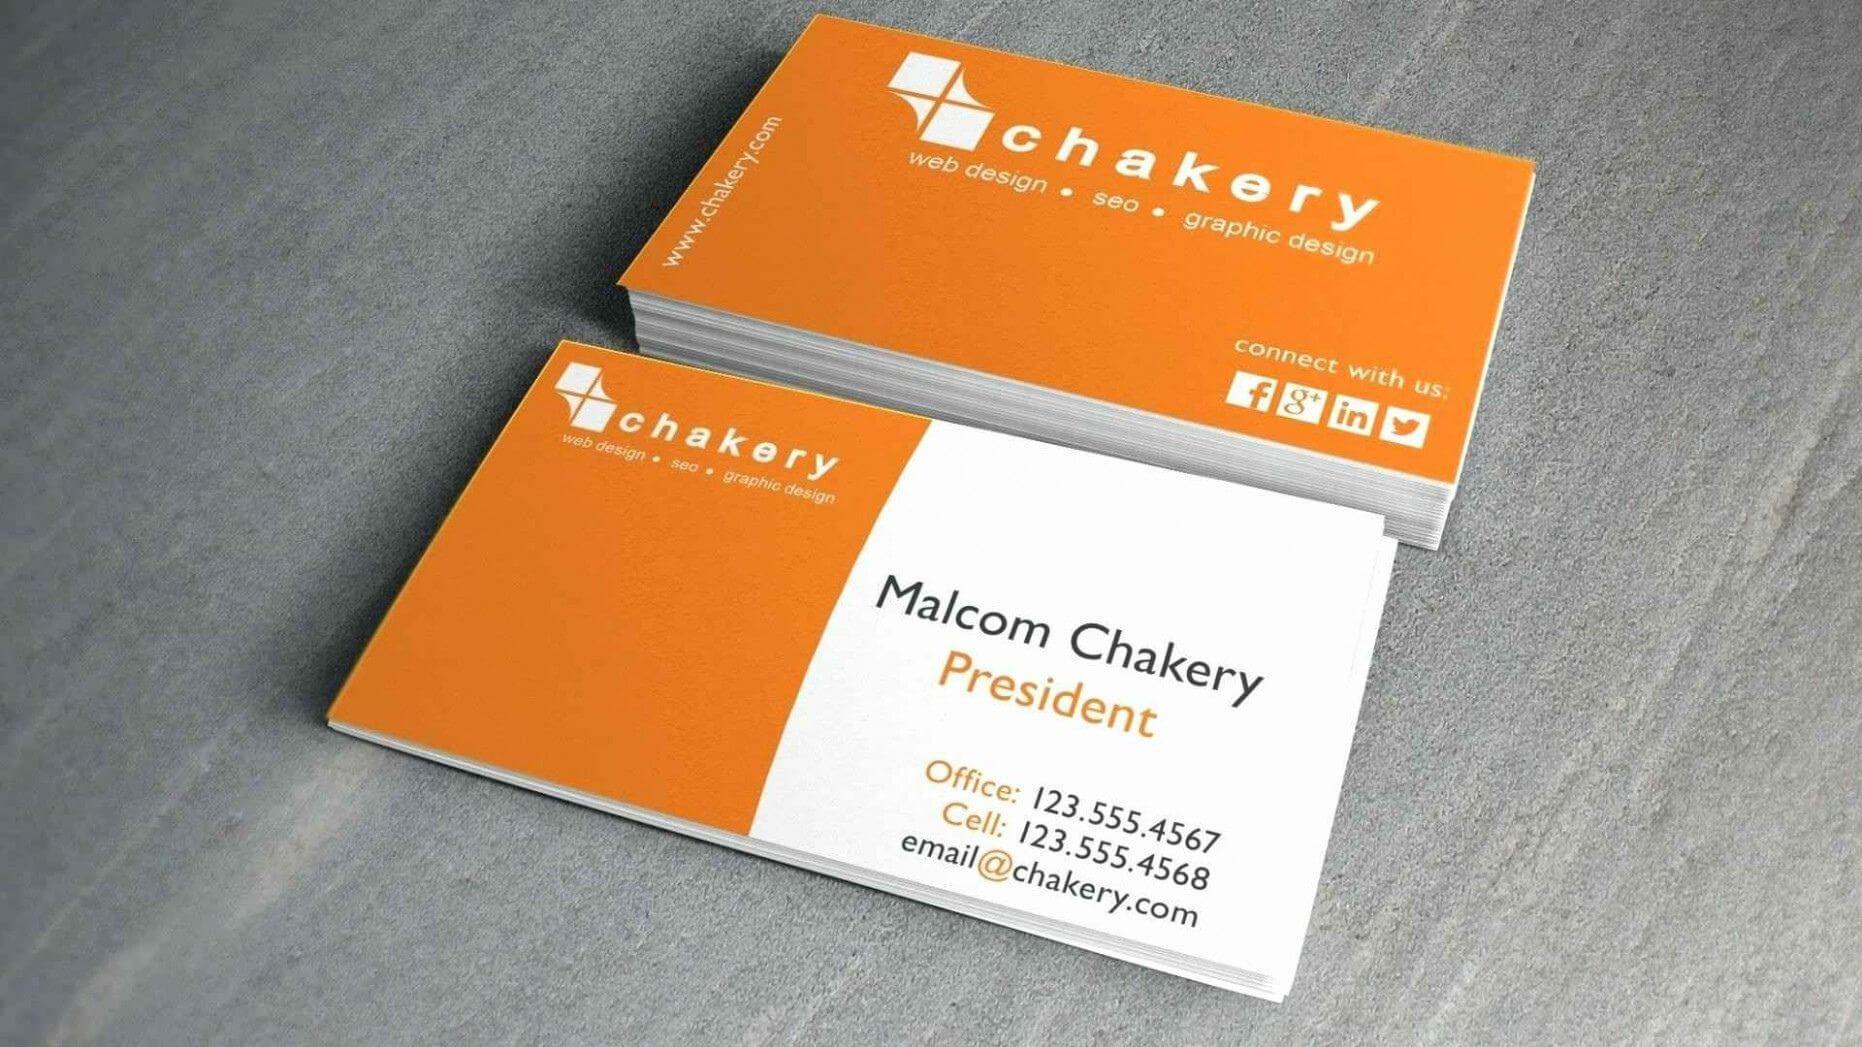 Pinanggunstore On Business Cards Inside Office Depot Business Card Template